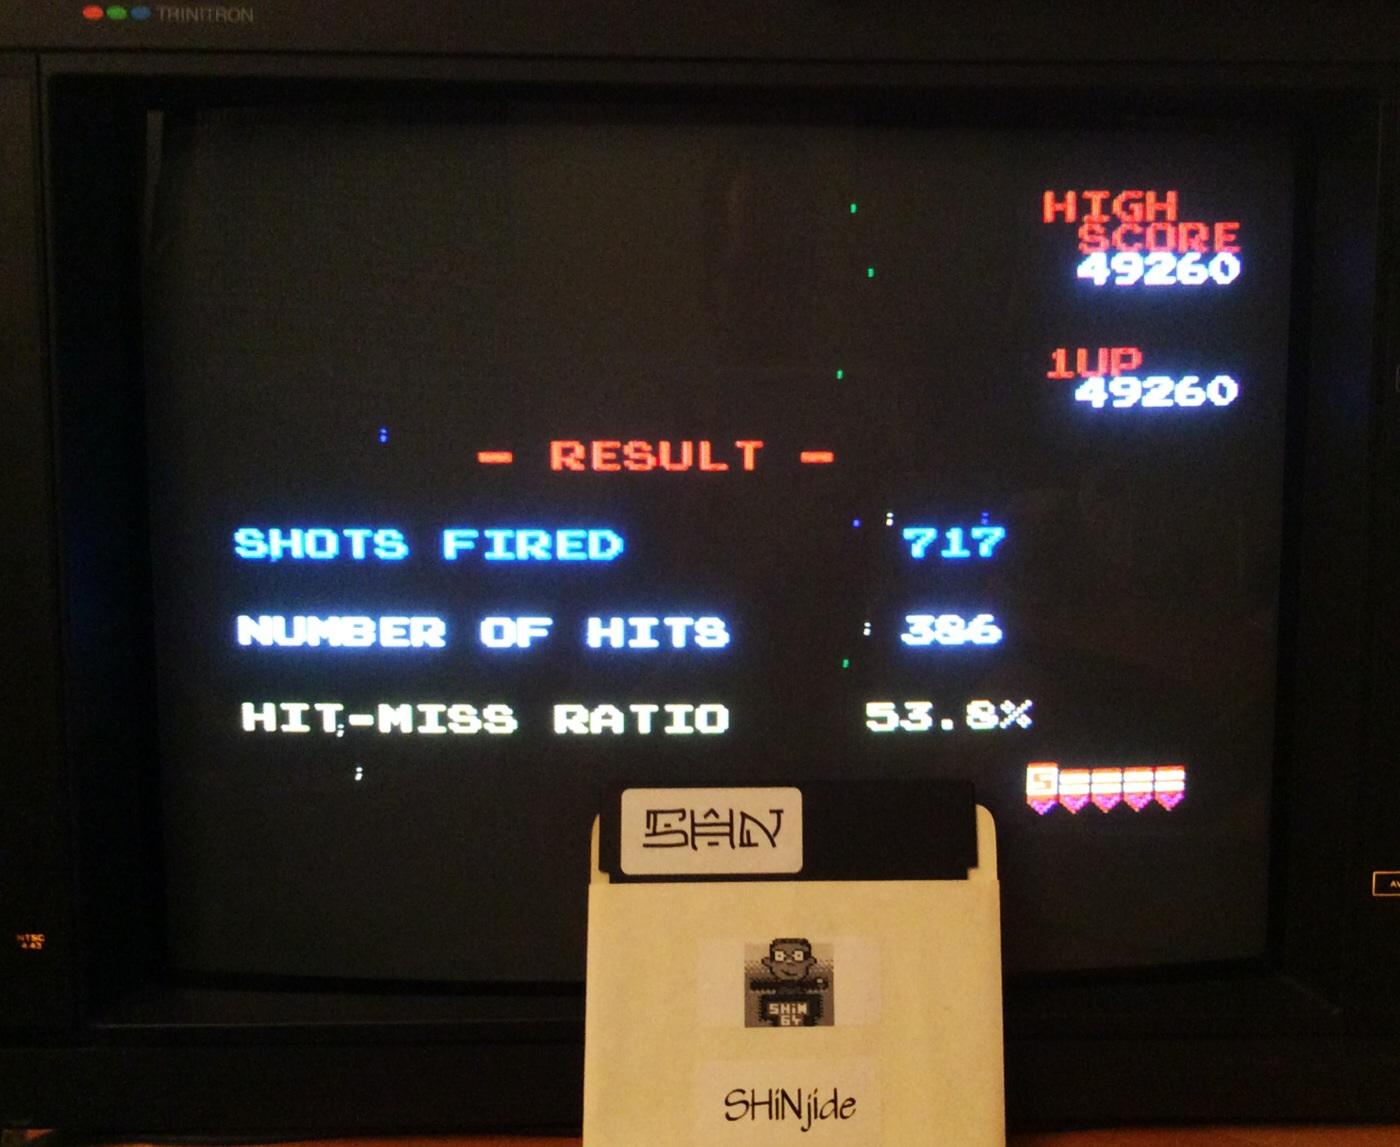 SHiNjide: Galaga (NES/Famicom Emulated) 49,260 points on 2014-09-07 16:59:38